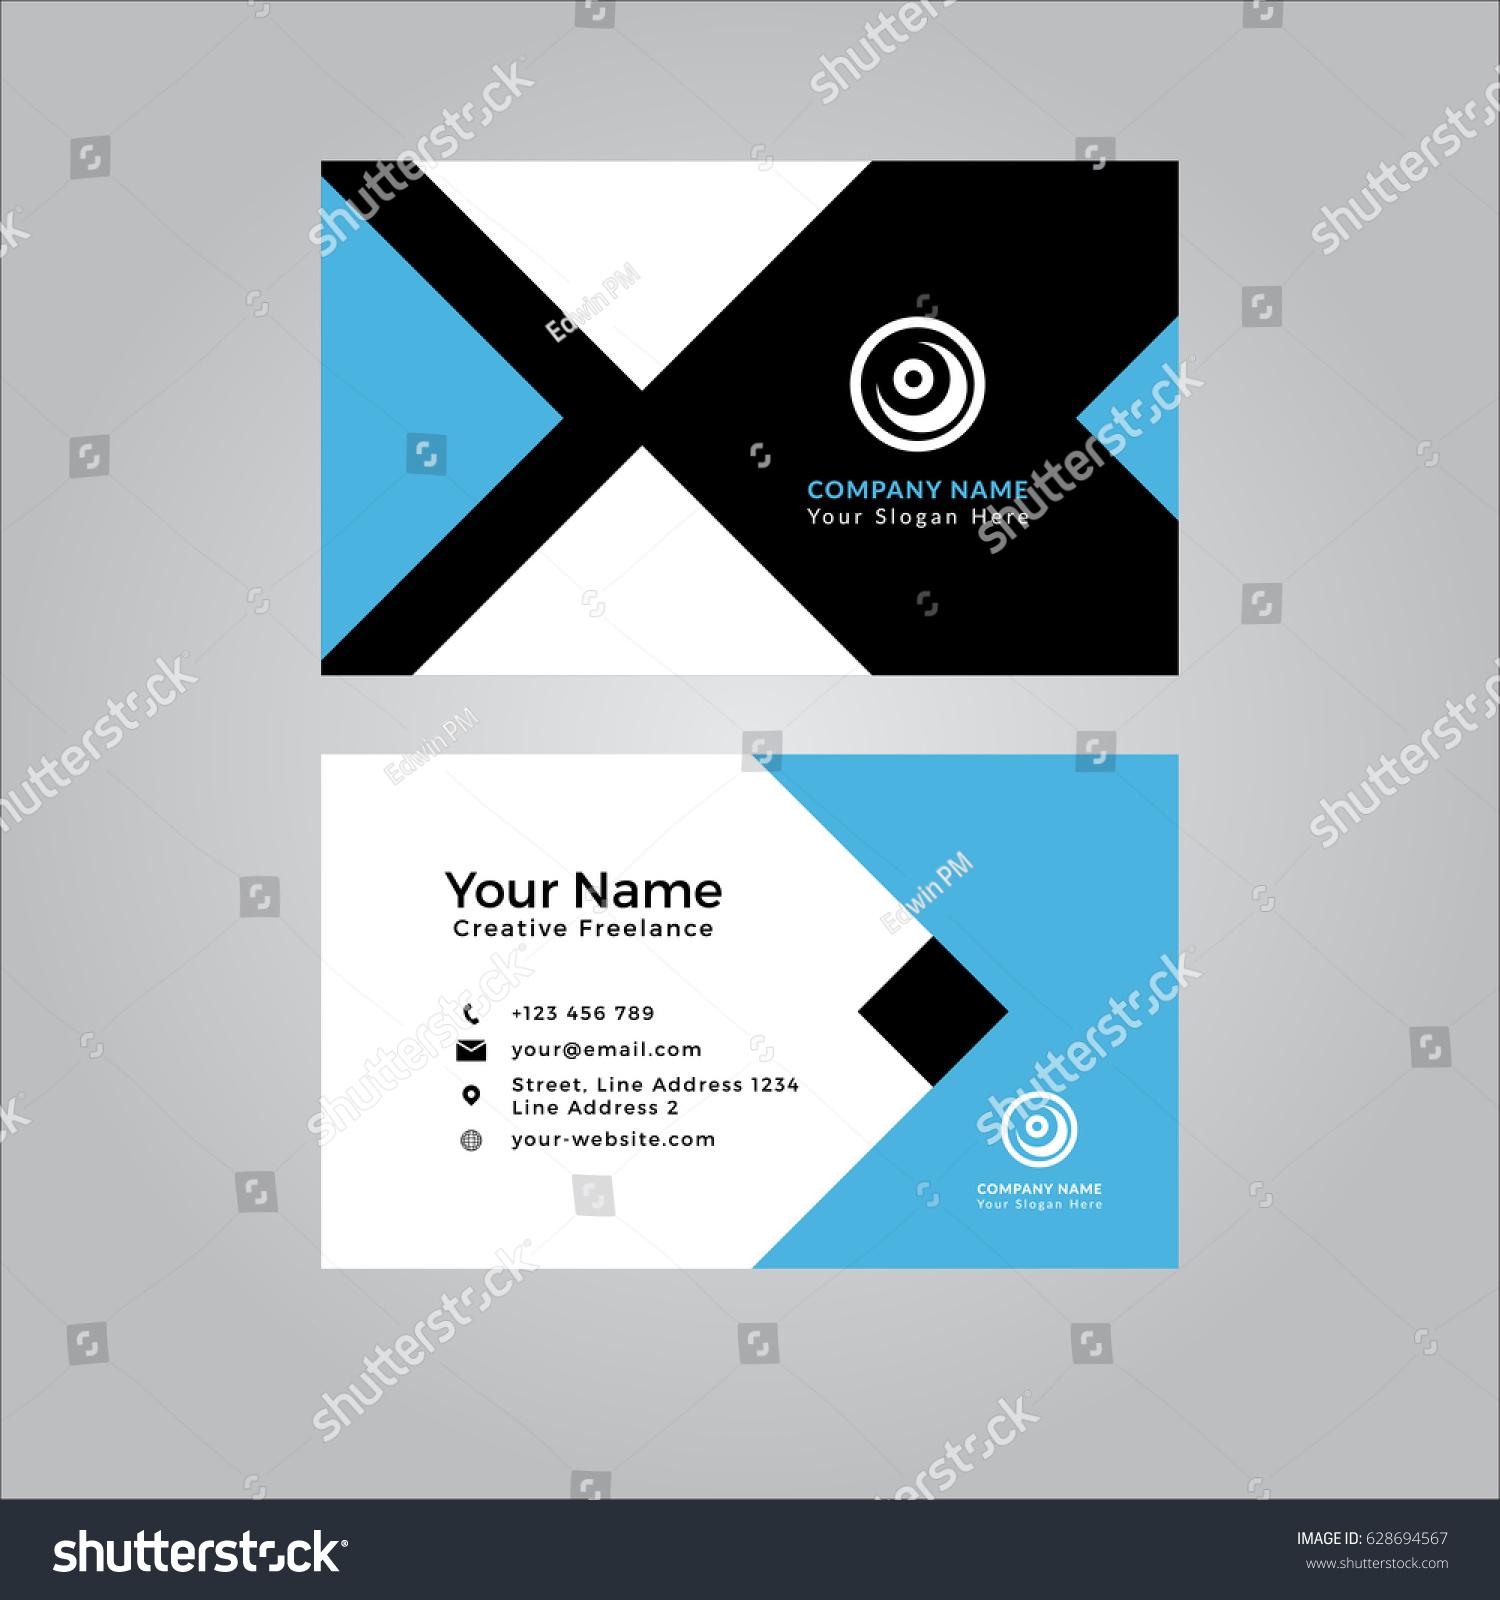 Website Business Card Template